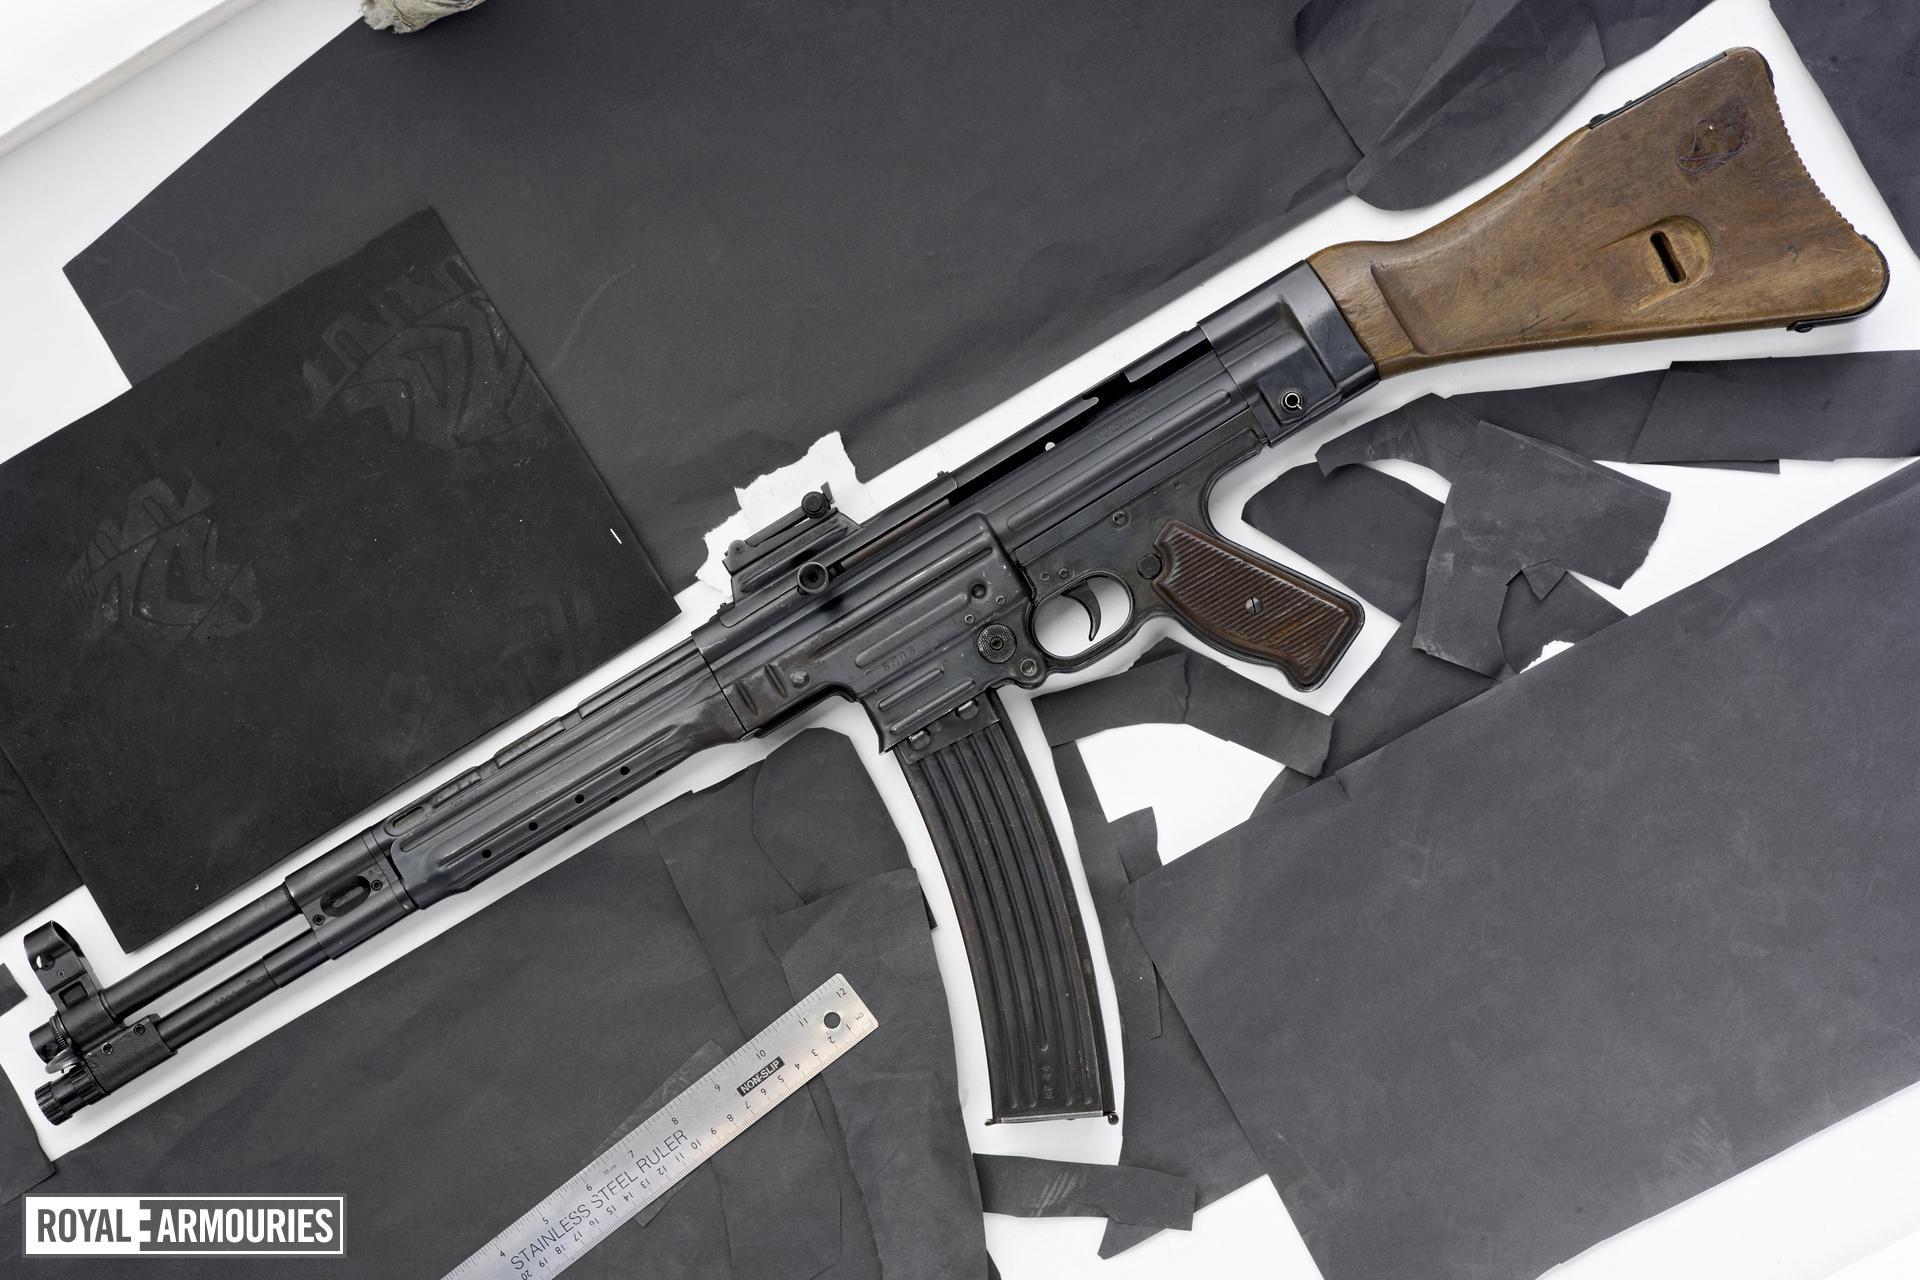 Centrefire automatic rifle - Haenel Mkb42 (H)